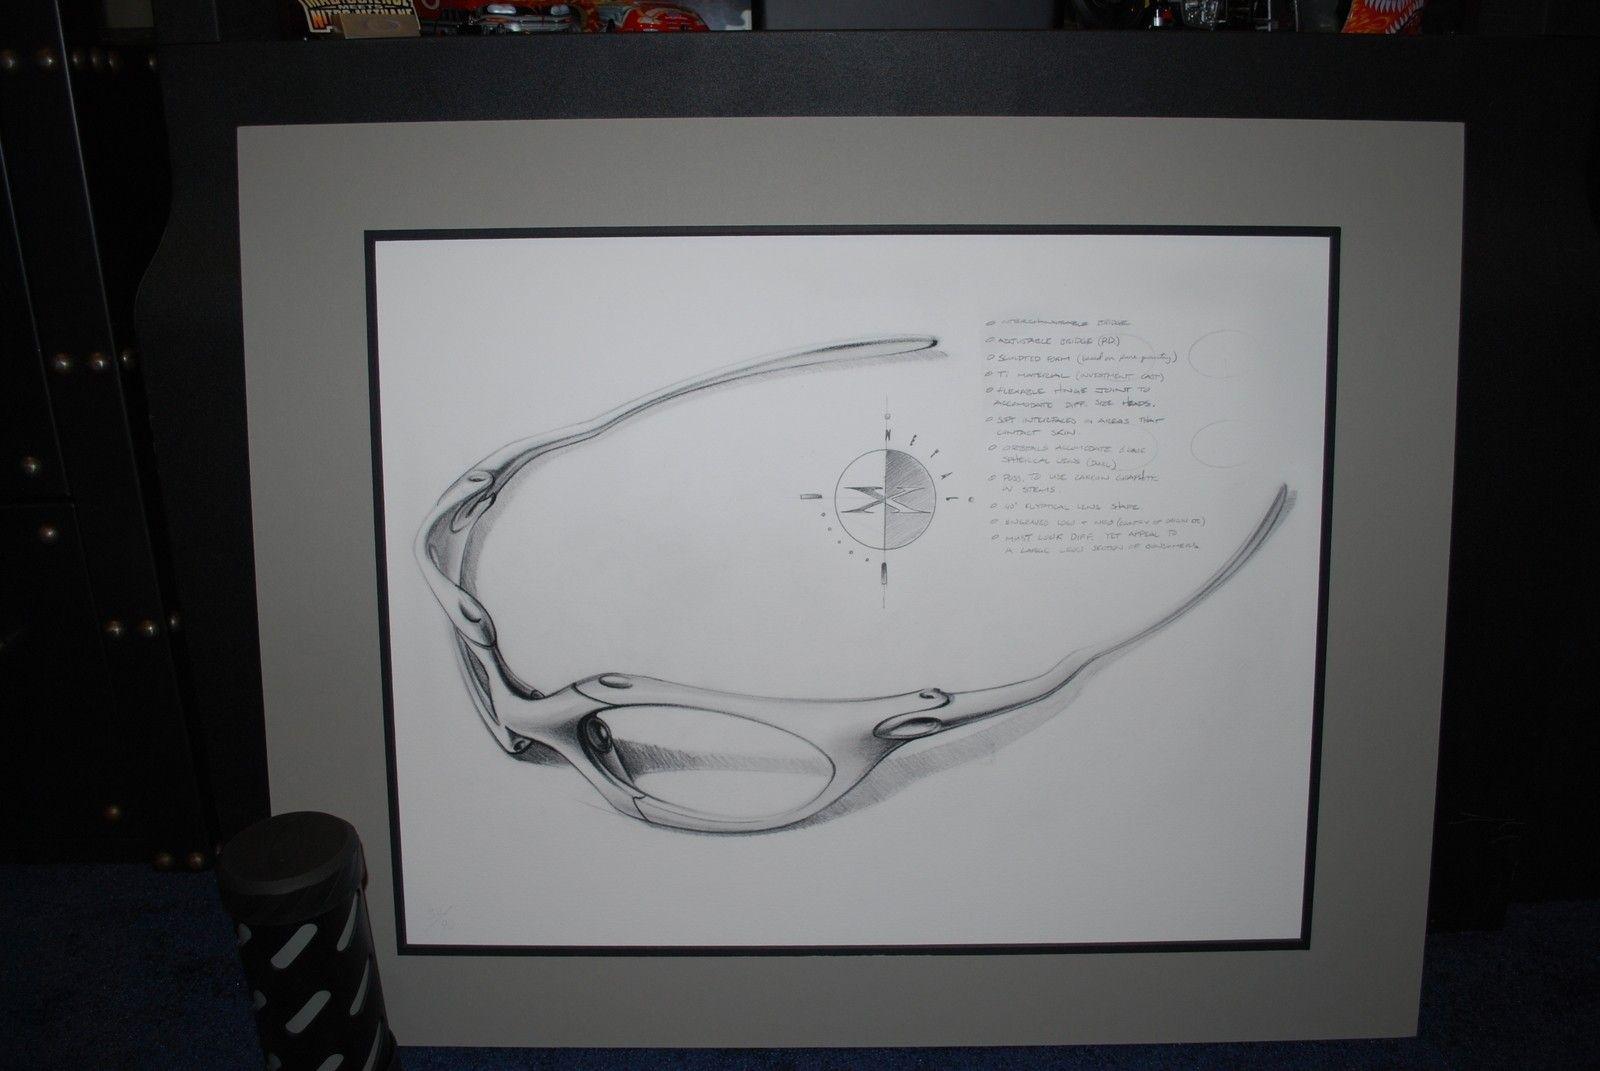 Oakley Giclee Romeo sketch/lithograph - DSC_0297.JPG